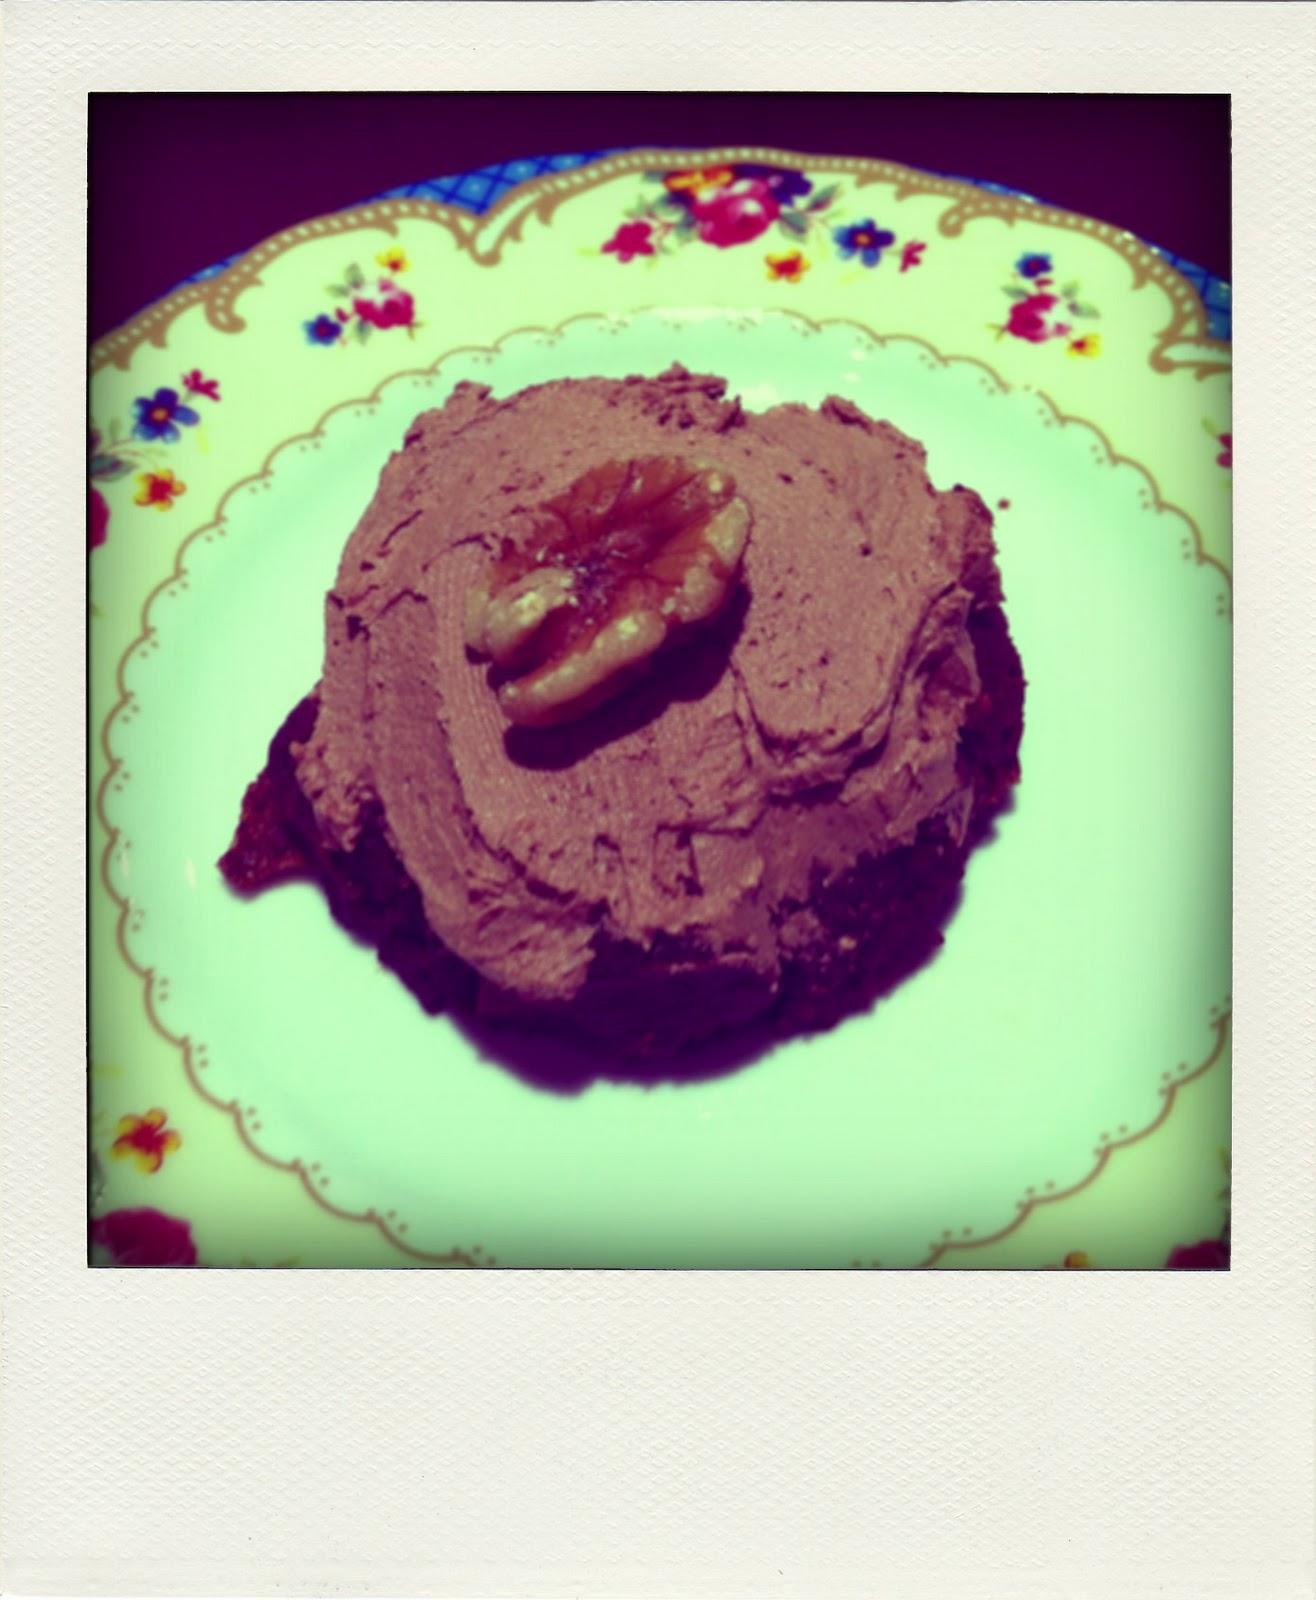 Edinburgh Eats: Baking Sunday: Afghan Biscuits